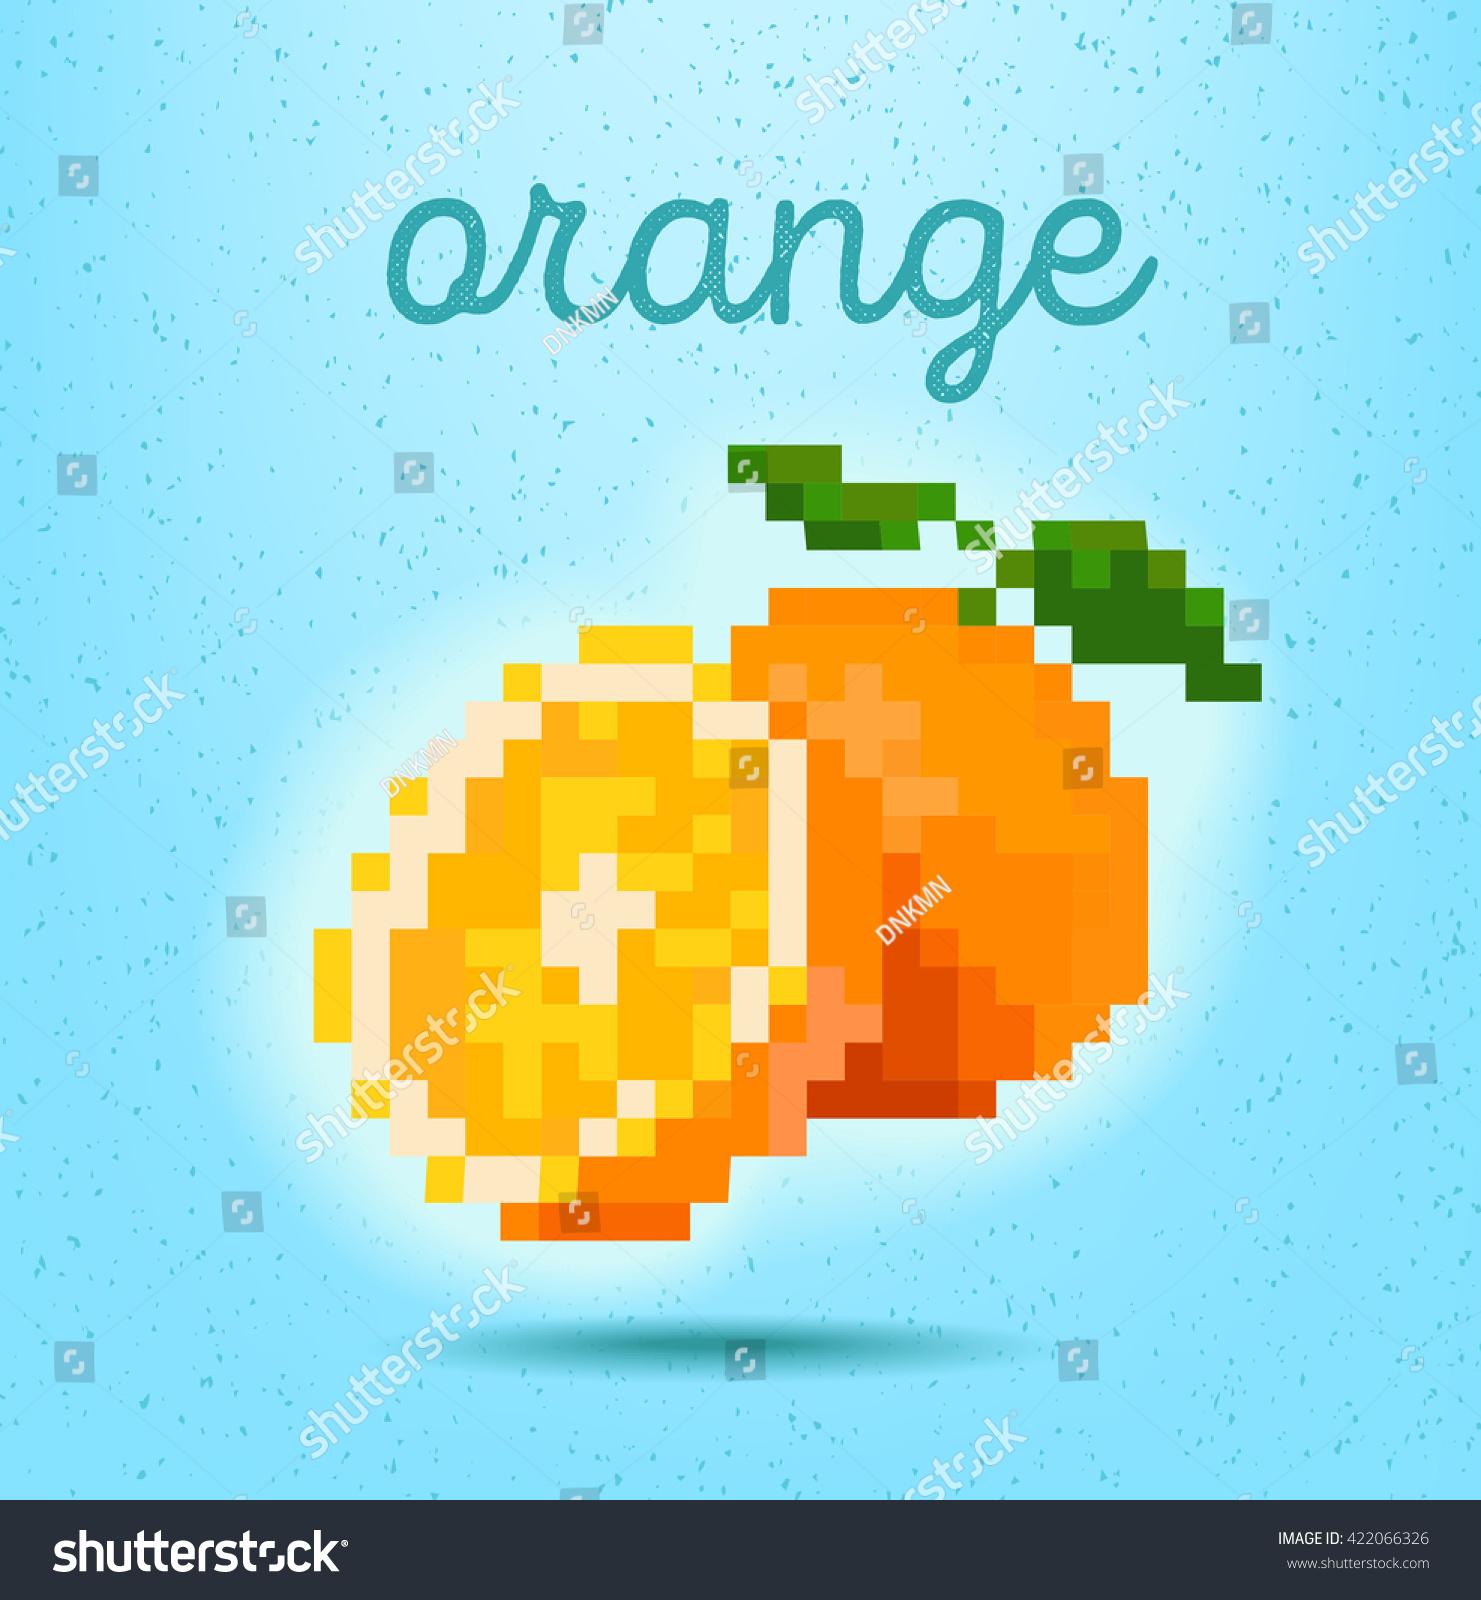 Pixelart Style Poster Slice Orange Whole Stock Vector Royalty Free 422066326